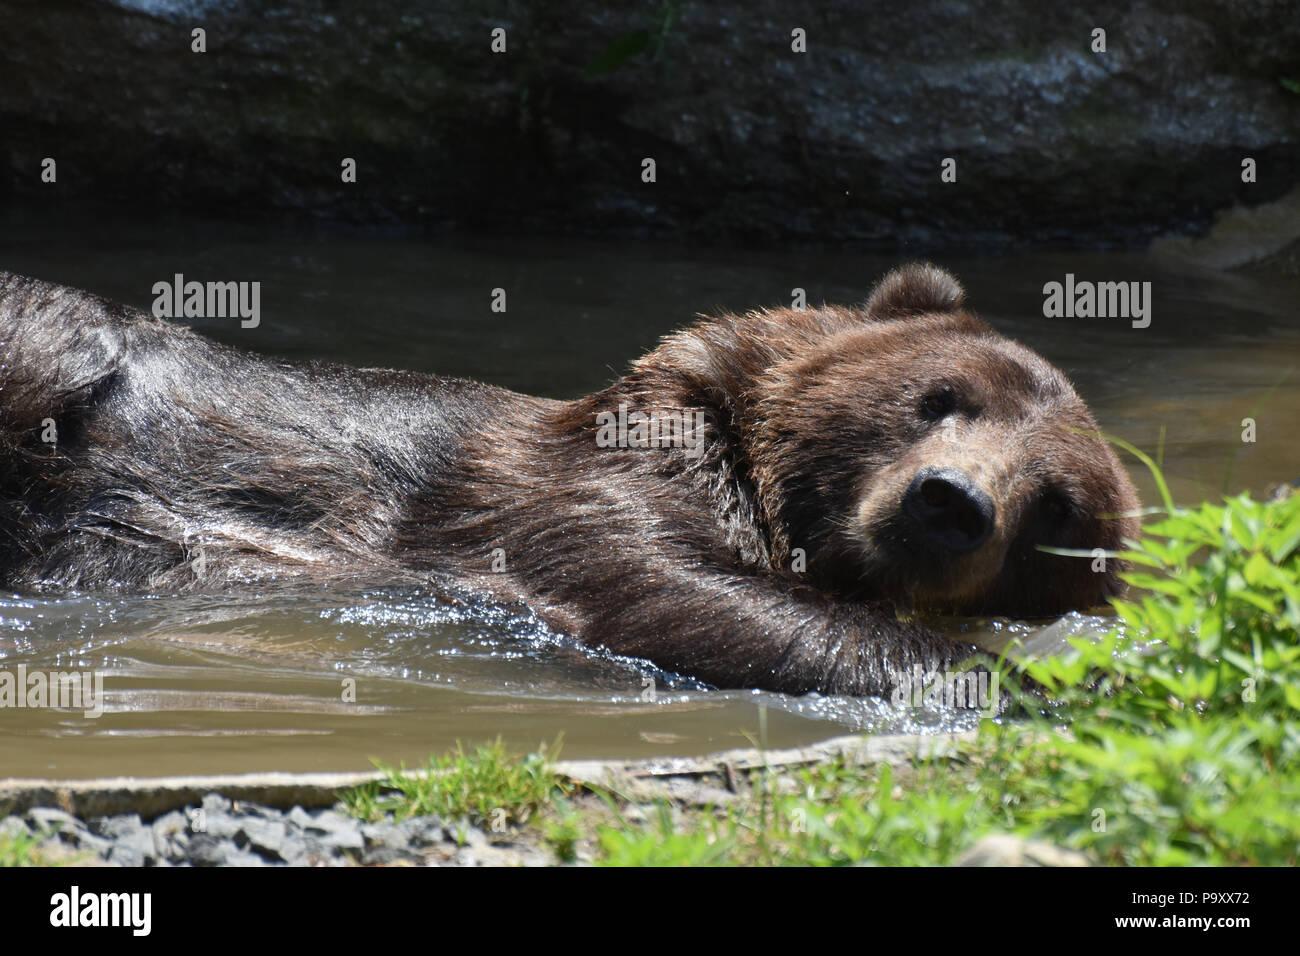 Wild silvertip bear bathing in the water - Stock Image